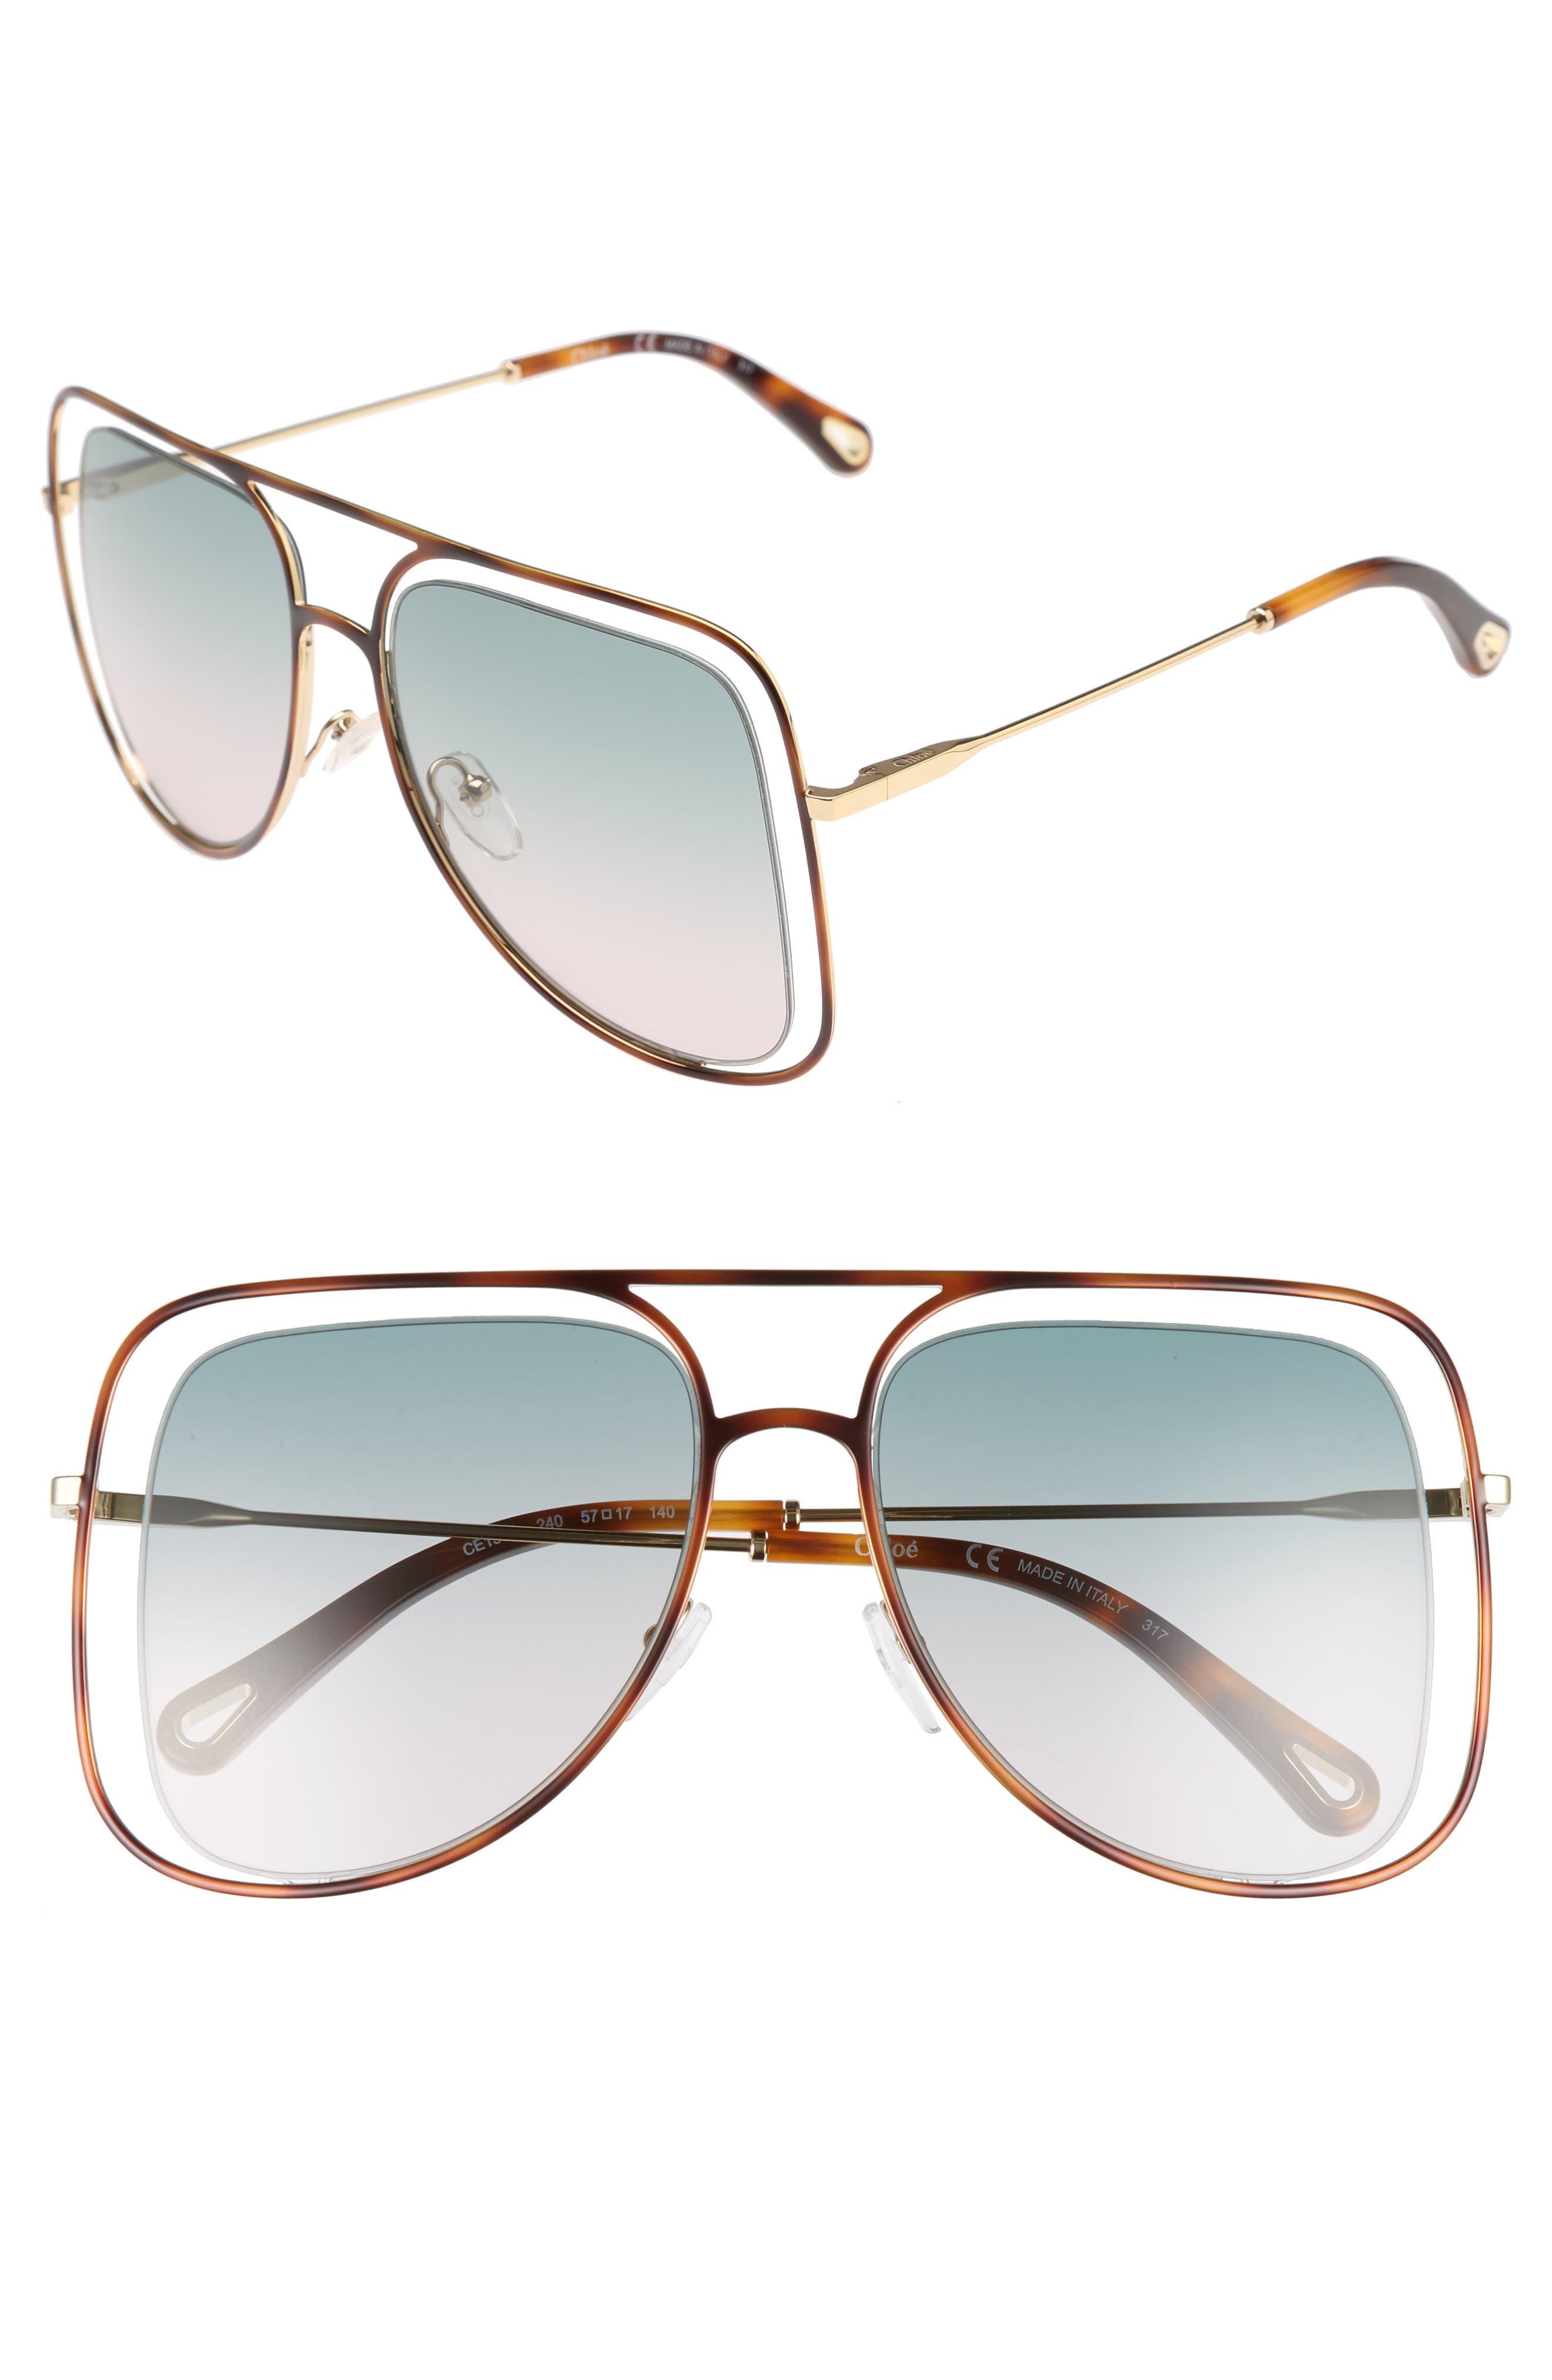 Main Image - Chloé 57mm Halo Frame Aviator Sunglasses